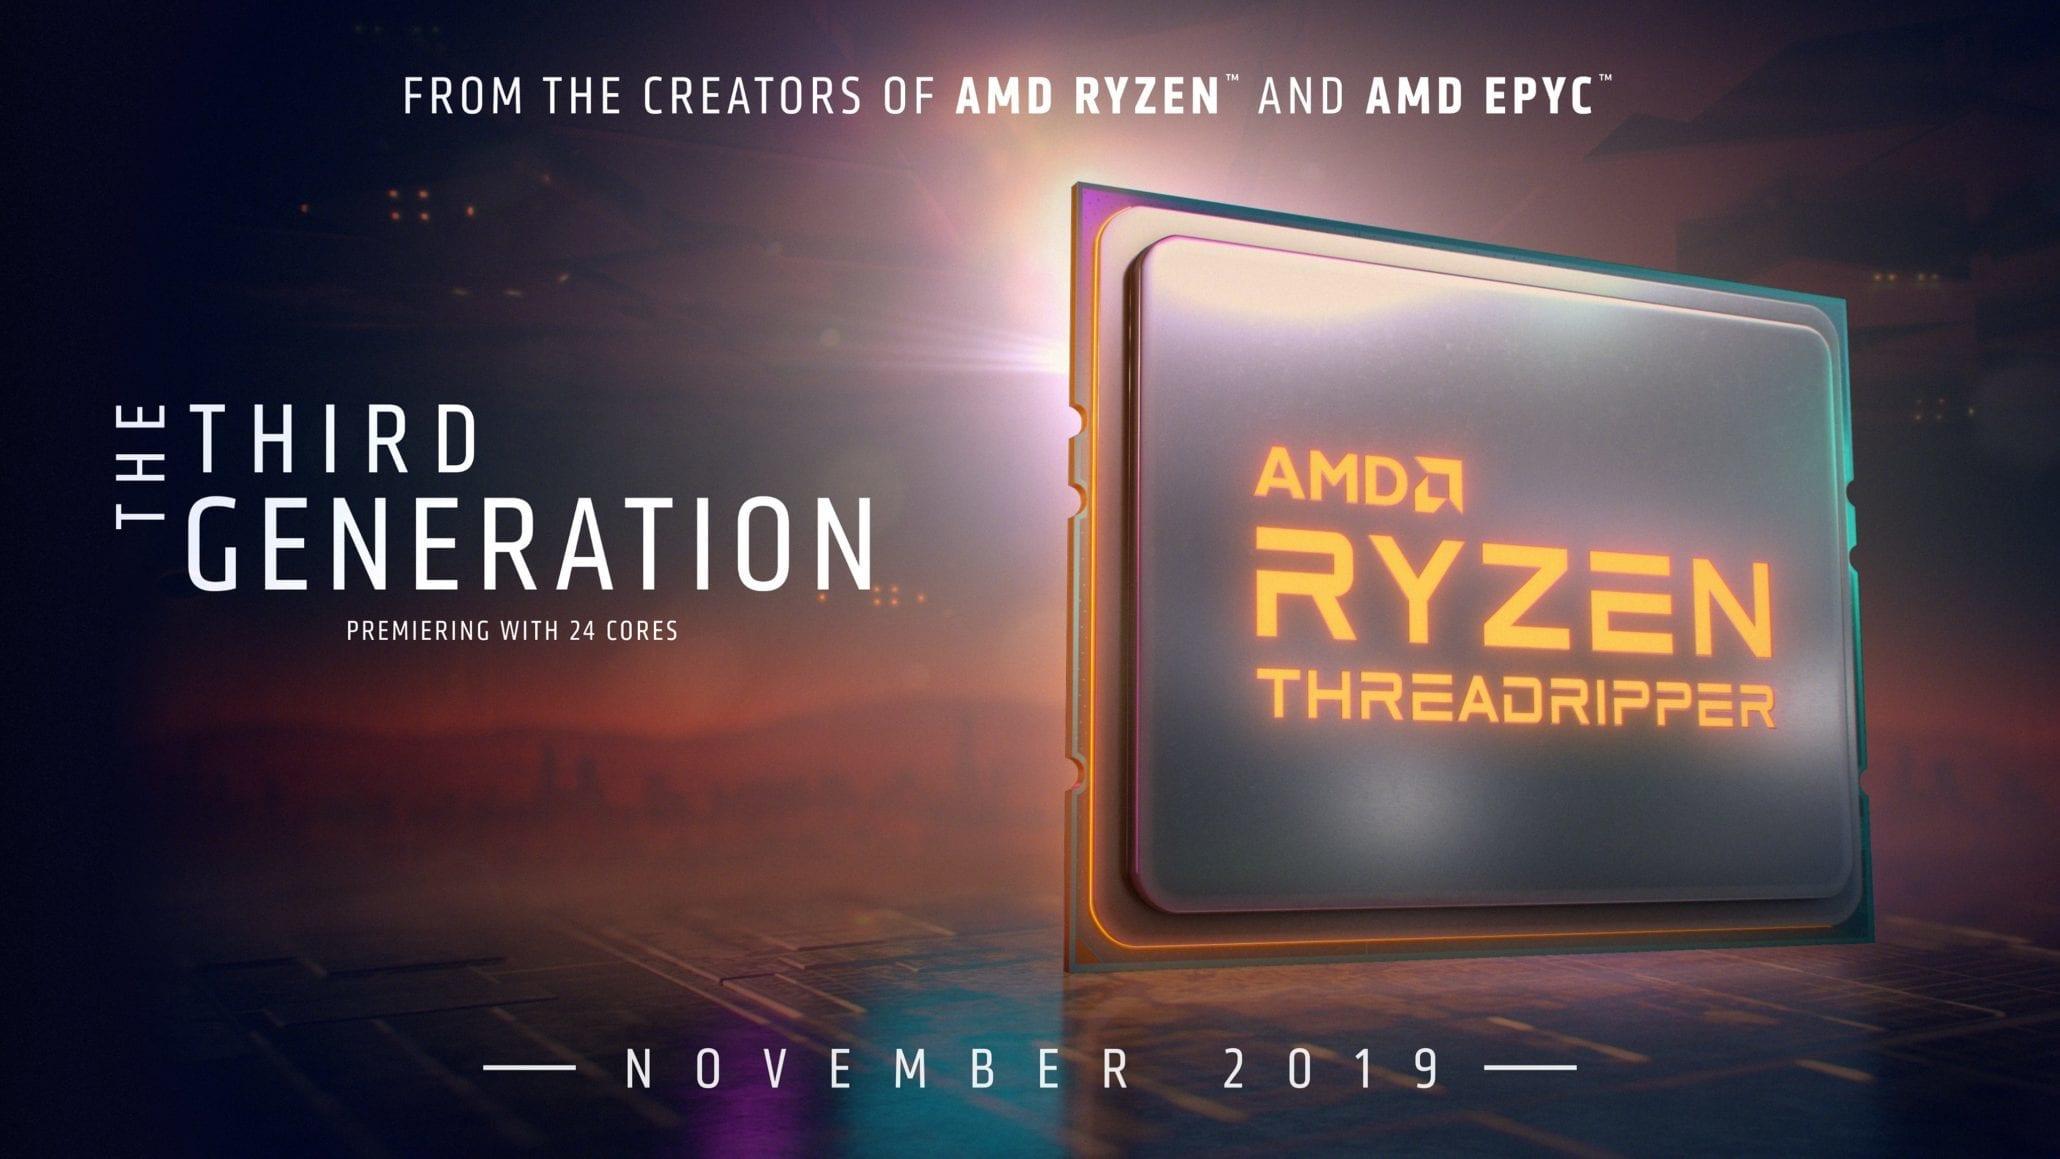 Niuulh превзошел keeph8n в модельном зачете процессора AMD Ryzen Threadripper 2970WX